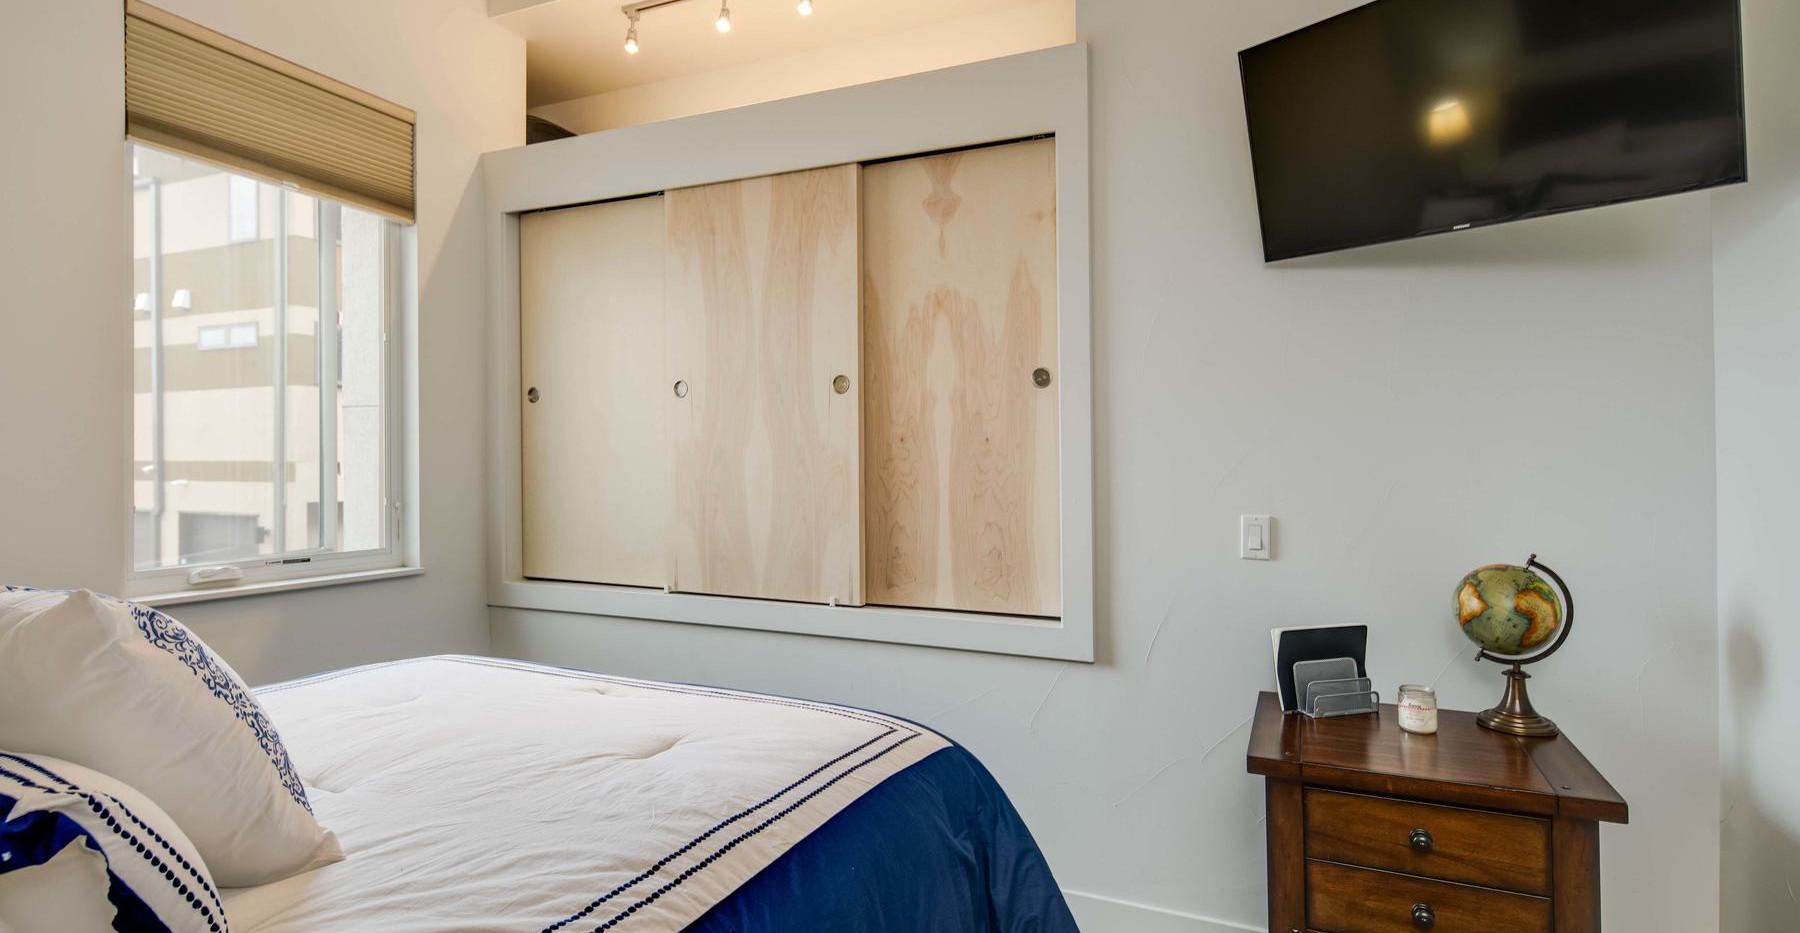 3434 Tejon Street-020-022-Bedroom-MLS_Si